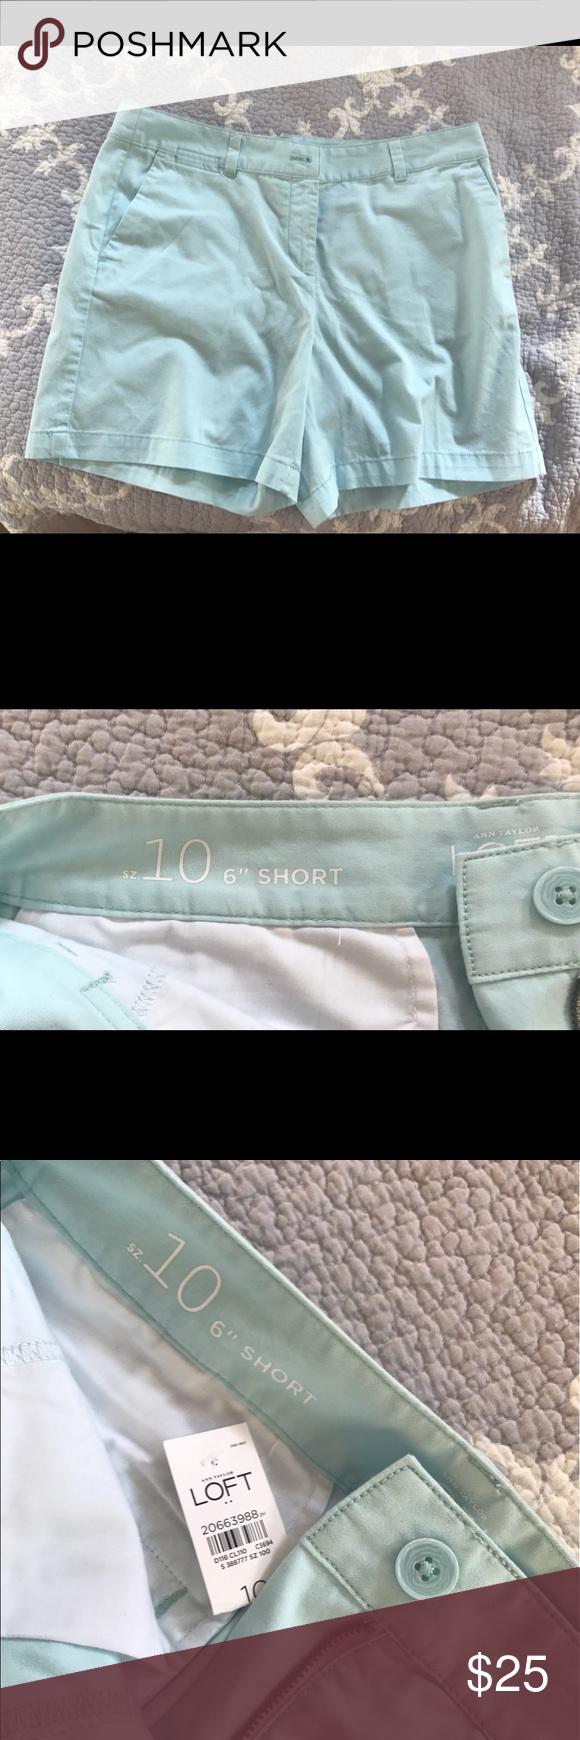 Ann Taylor loft shorts Beautiful Ann Taylor Loft light pastel blue 6 inch shorts. LOFT Shorts